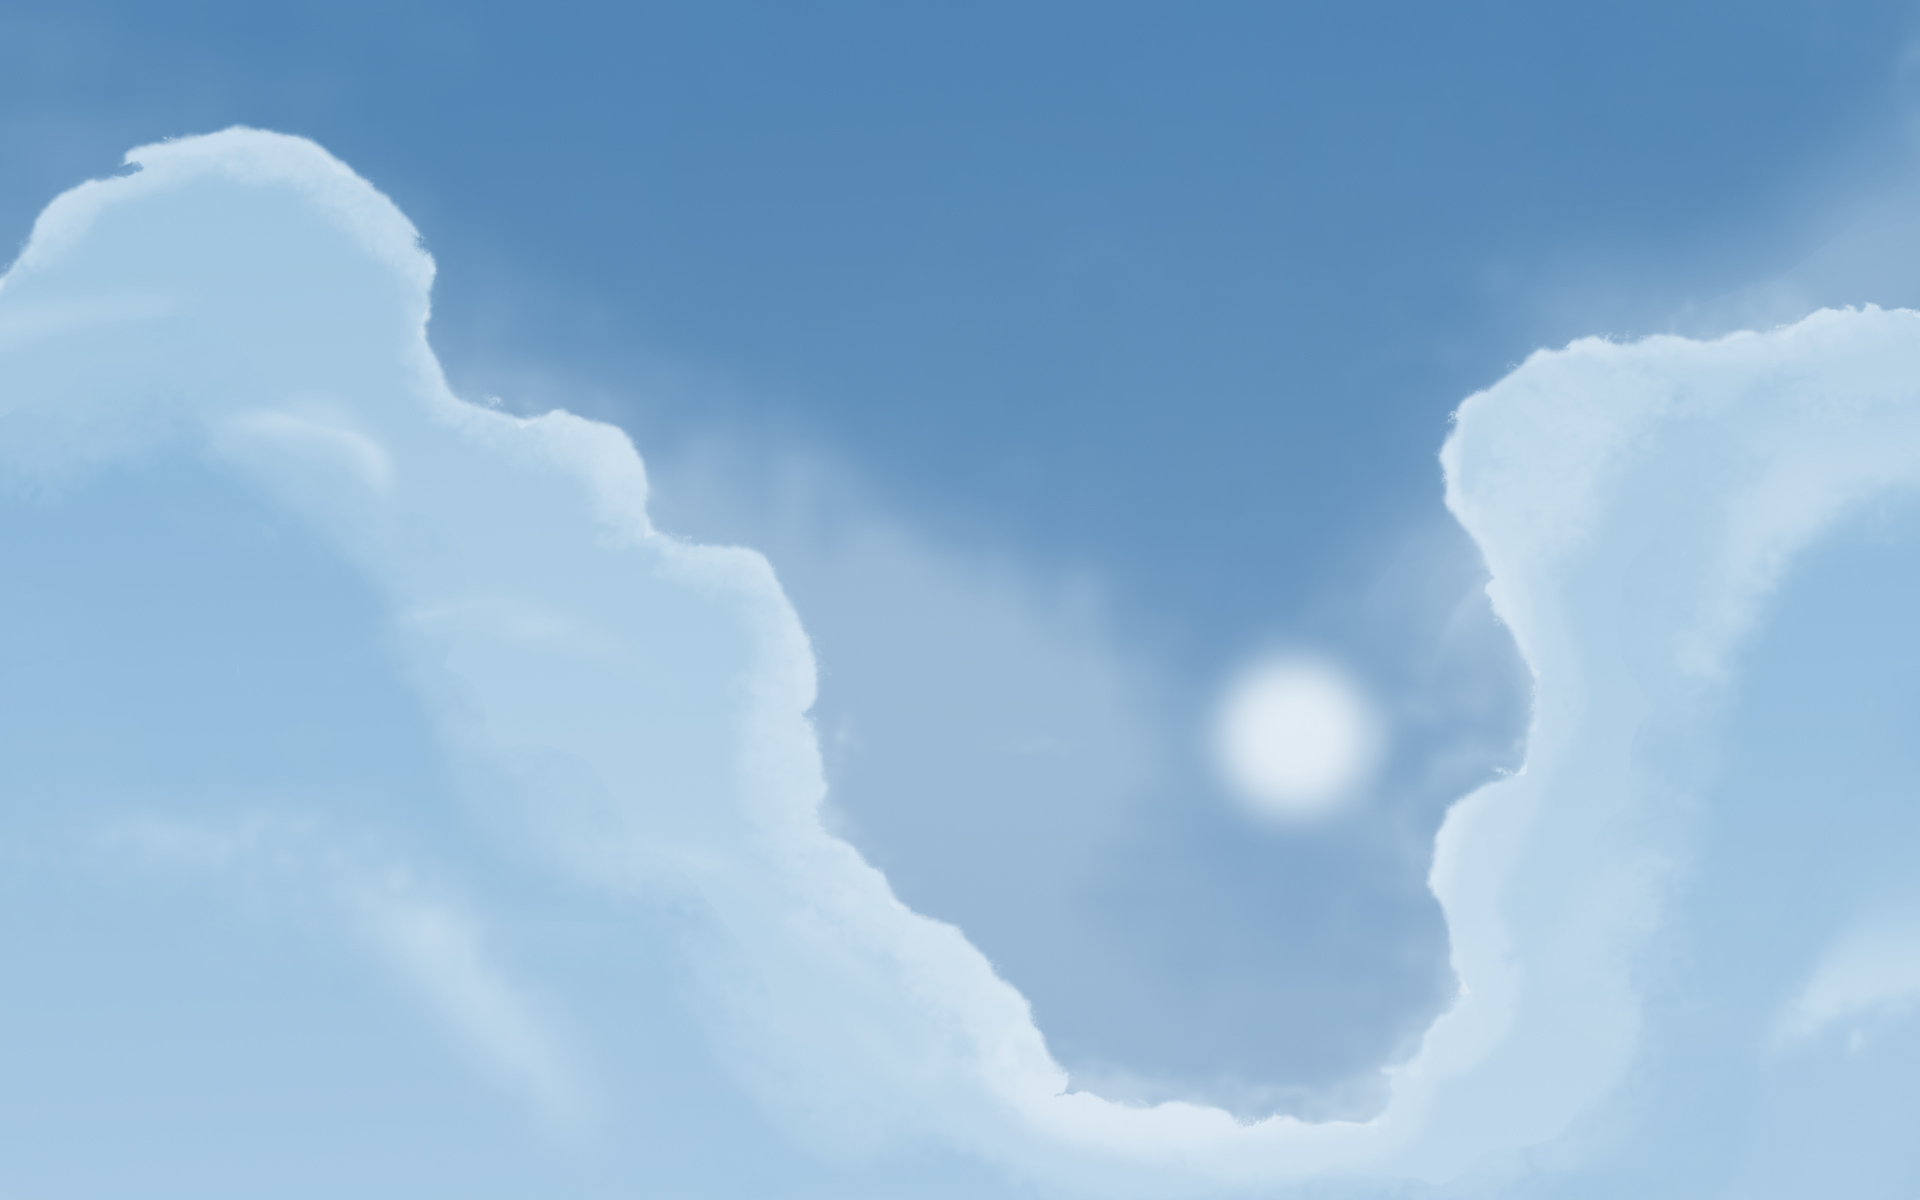 digital sky light blue wallpapers 1130 1920x1200jpg 1920x1200